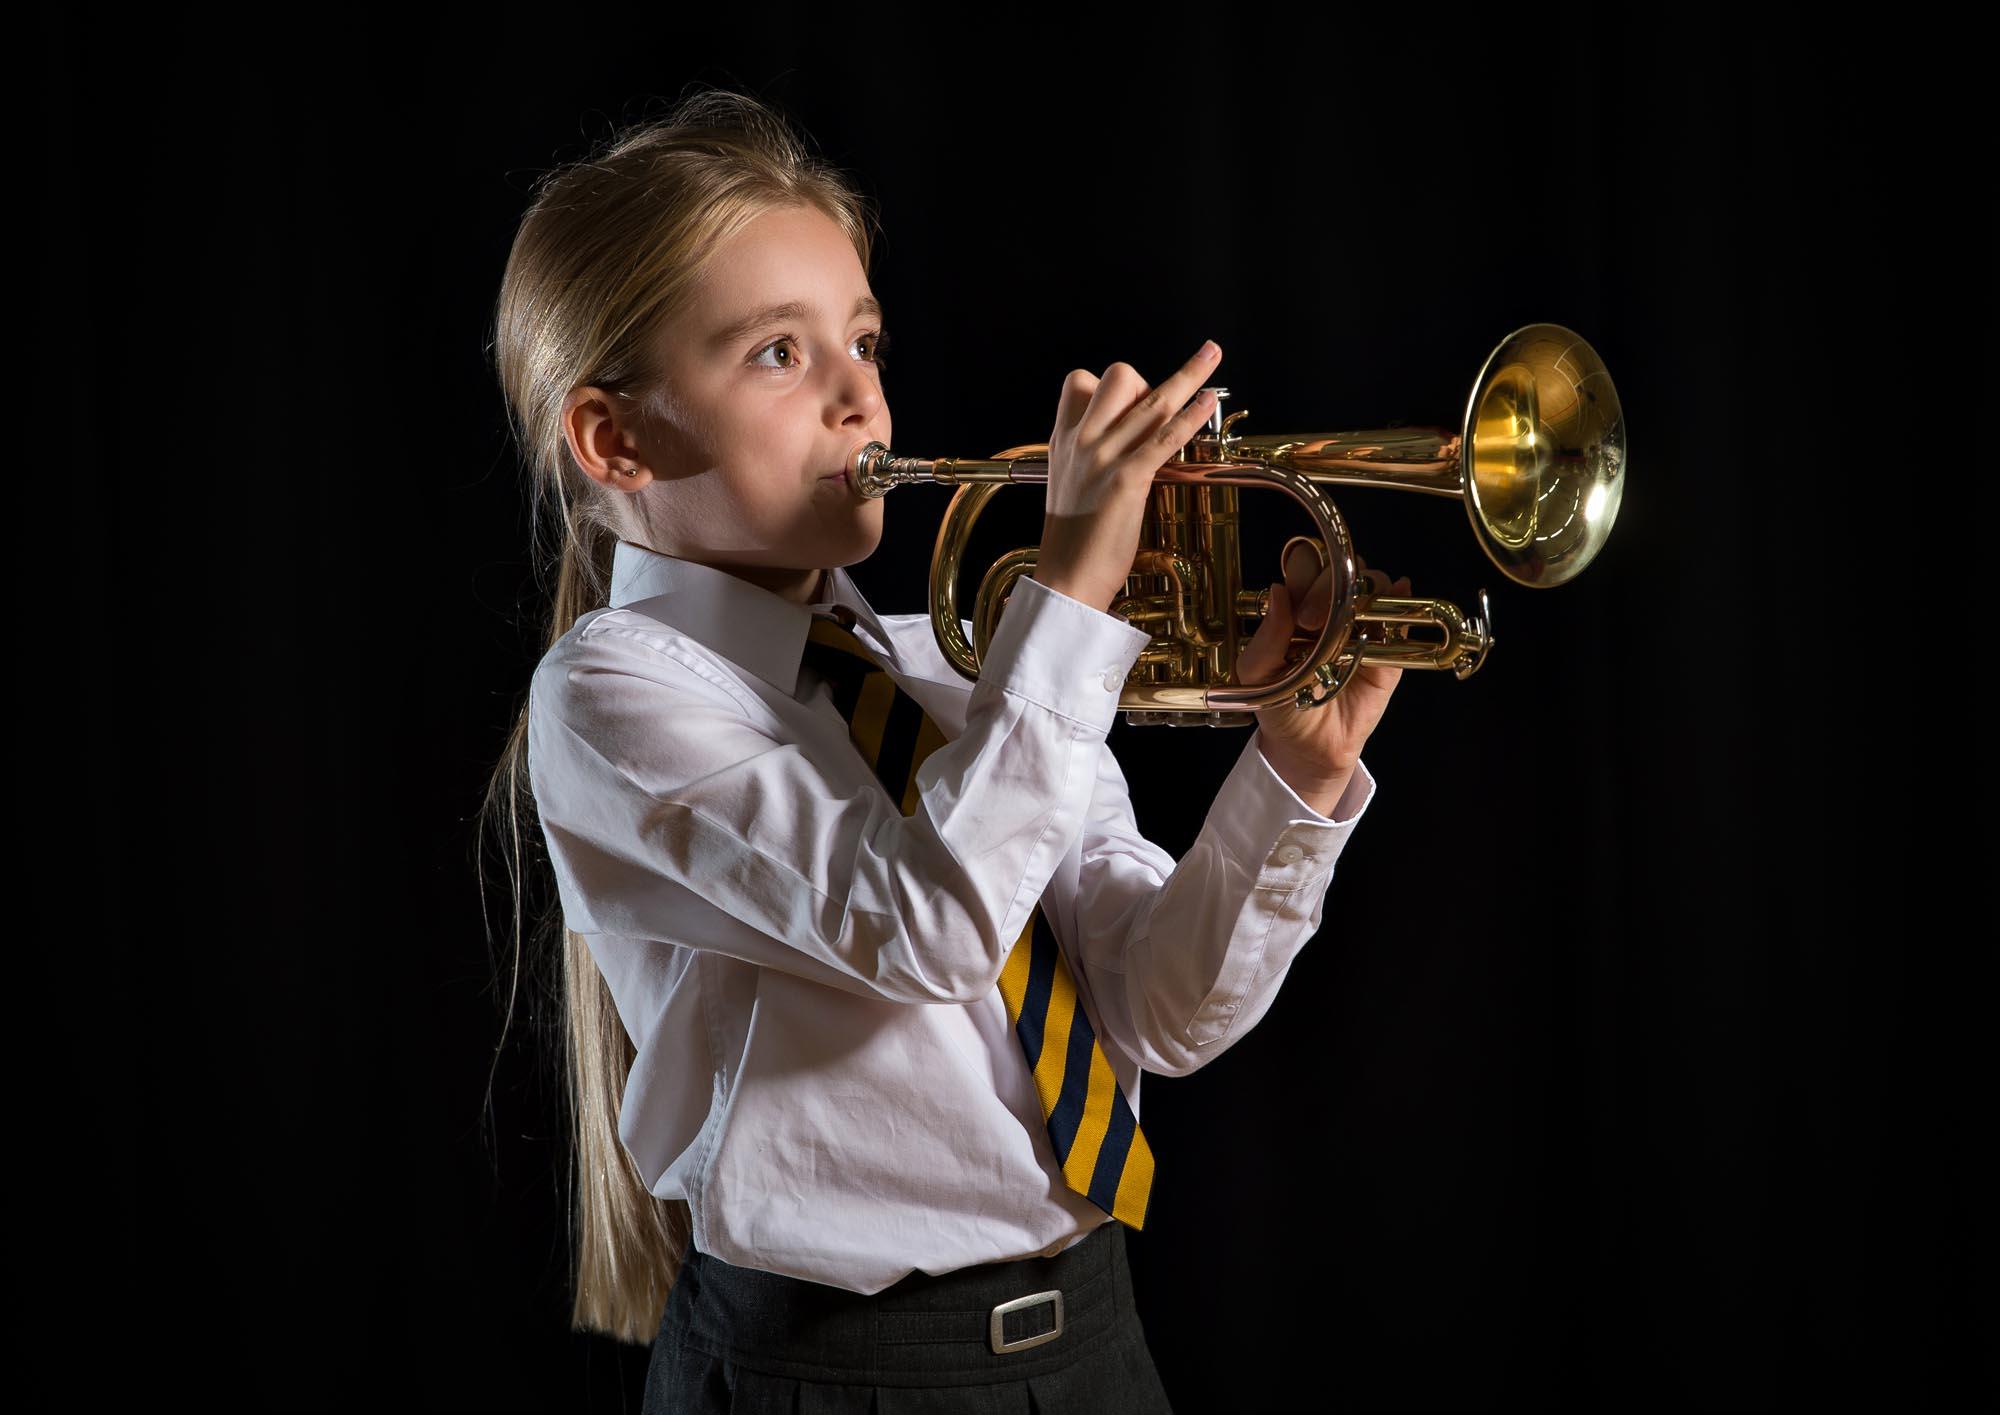 Girl playing cornet